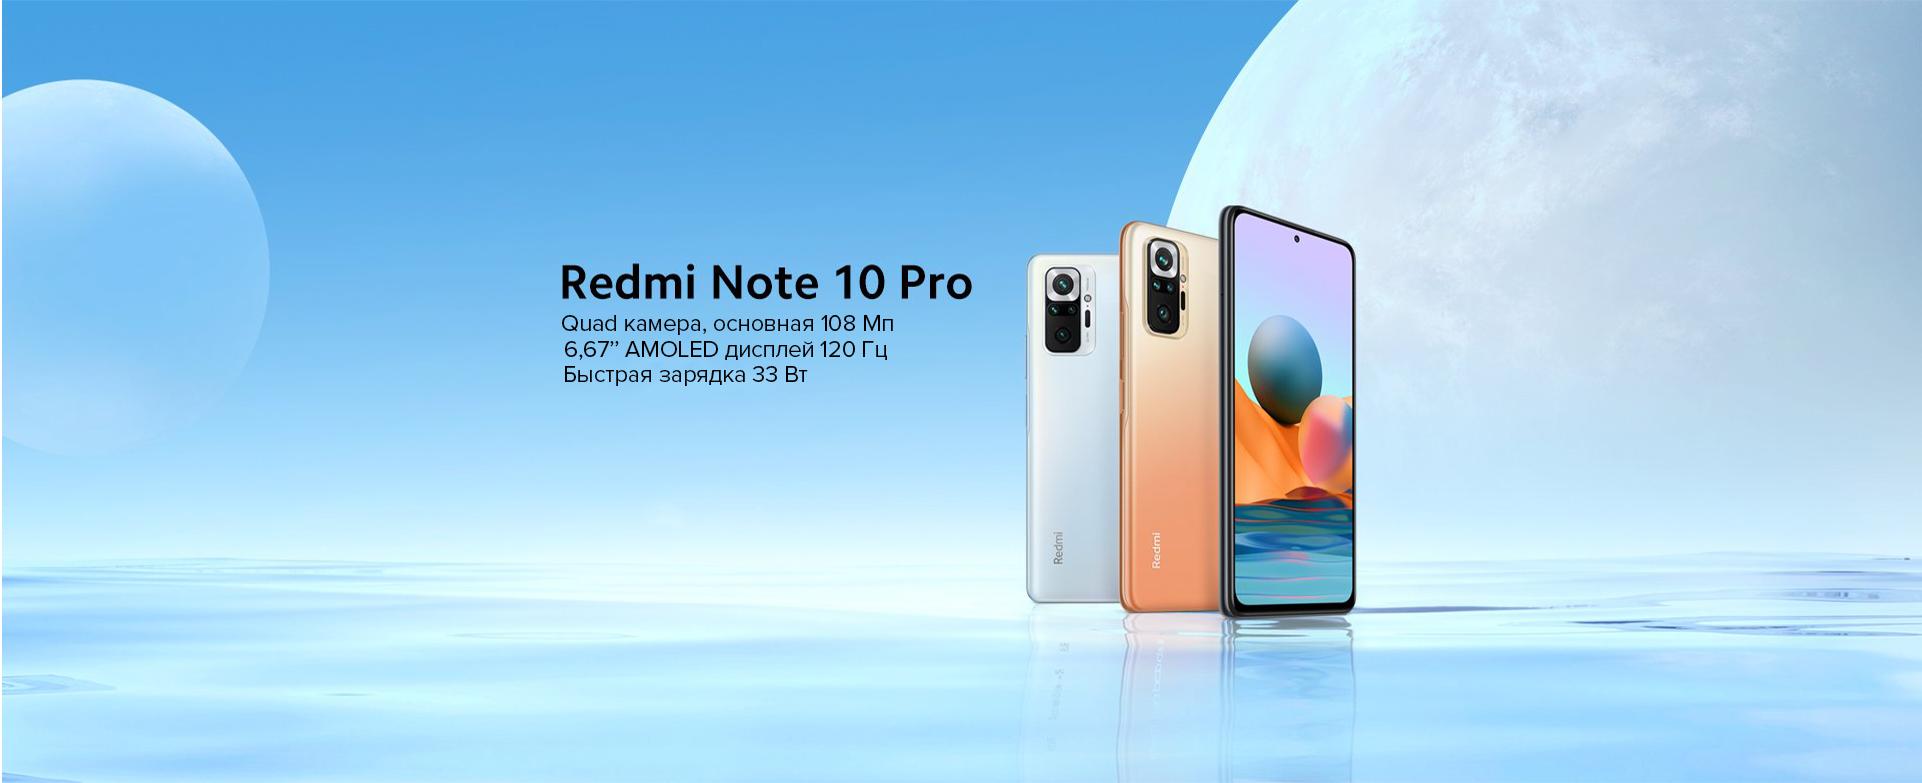 Redmi Note 10 Pro - Увидьте мир в 108 Мп!